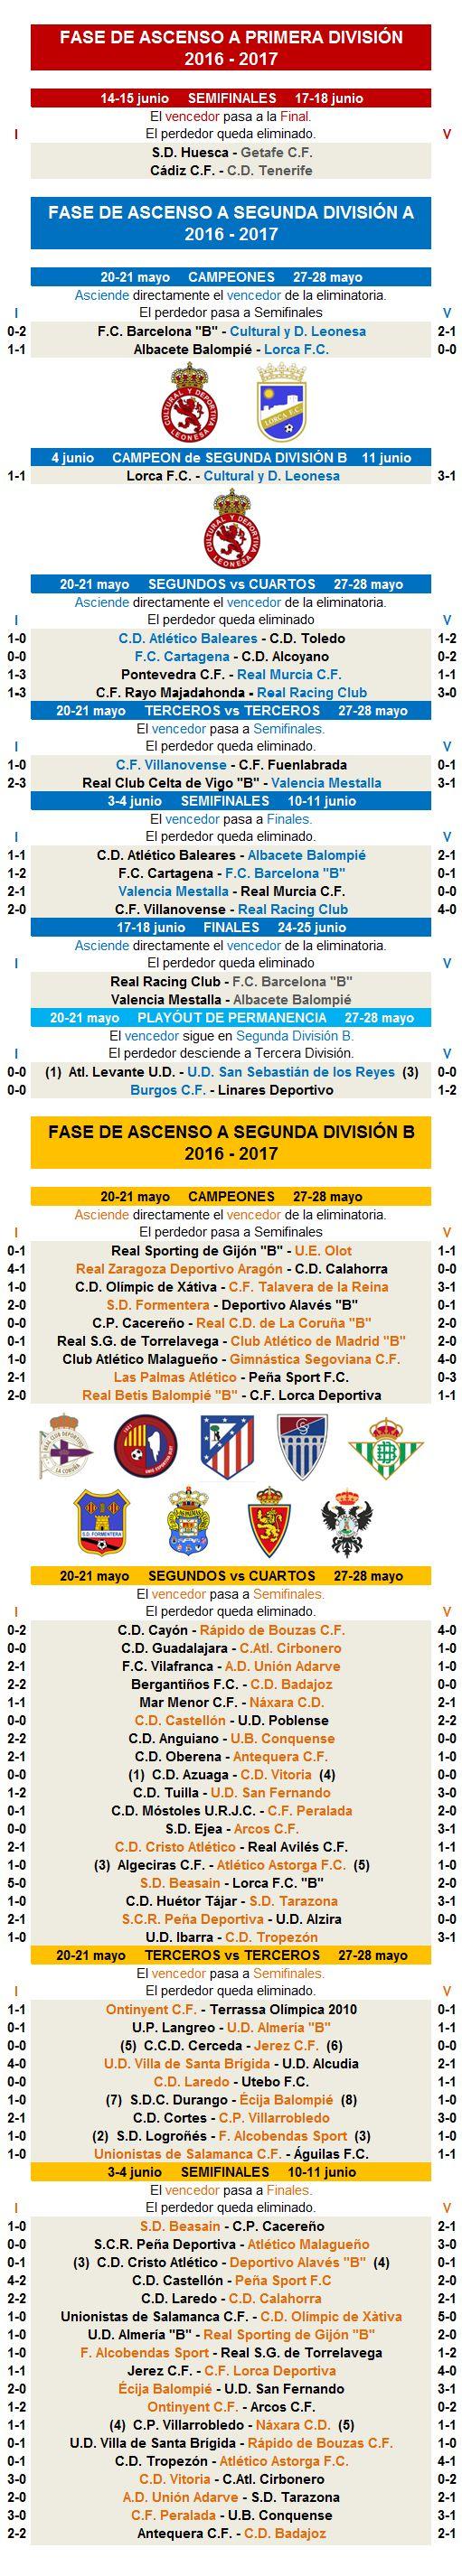 Promocion ascenso Segunda A Segunda B 2016-2017 jornada 4b